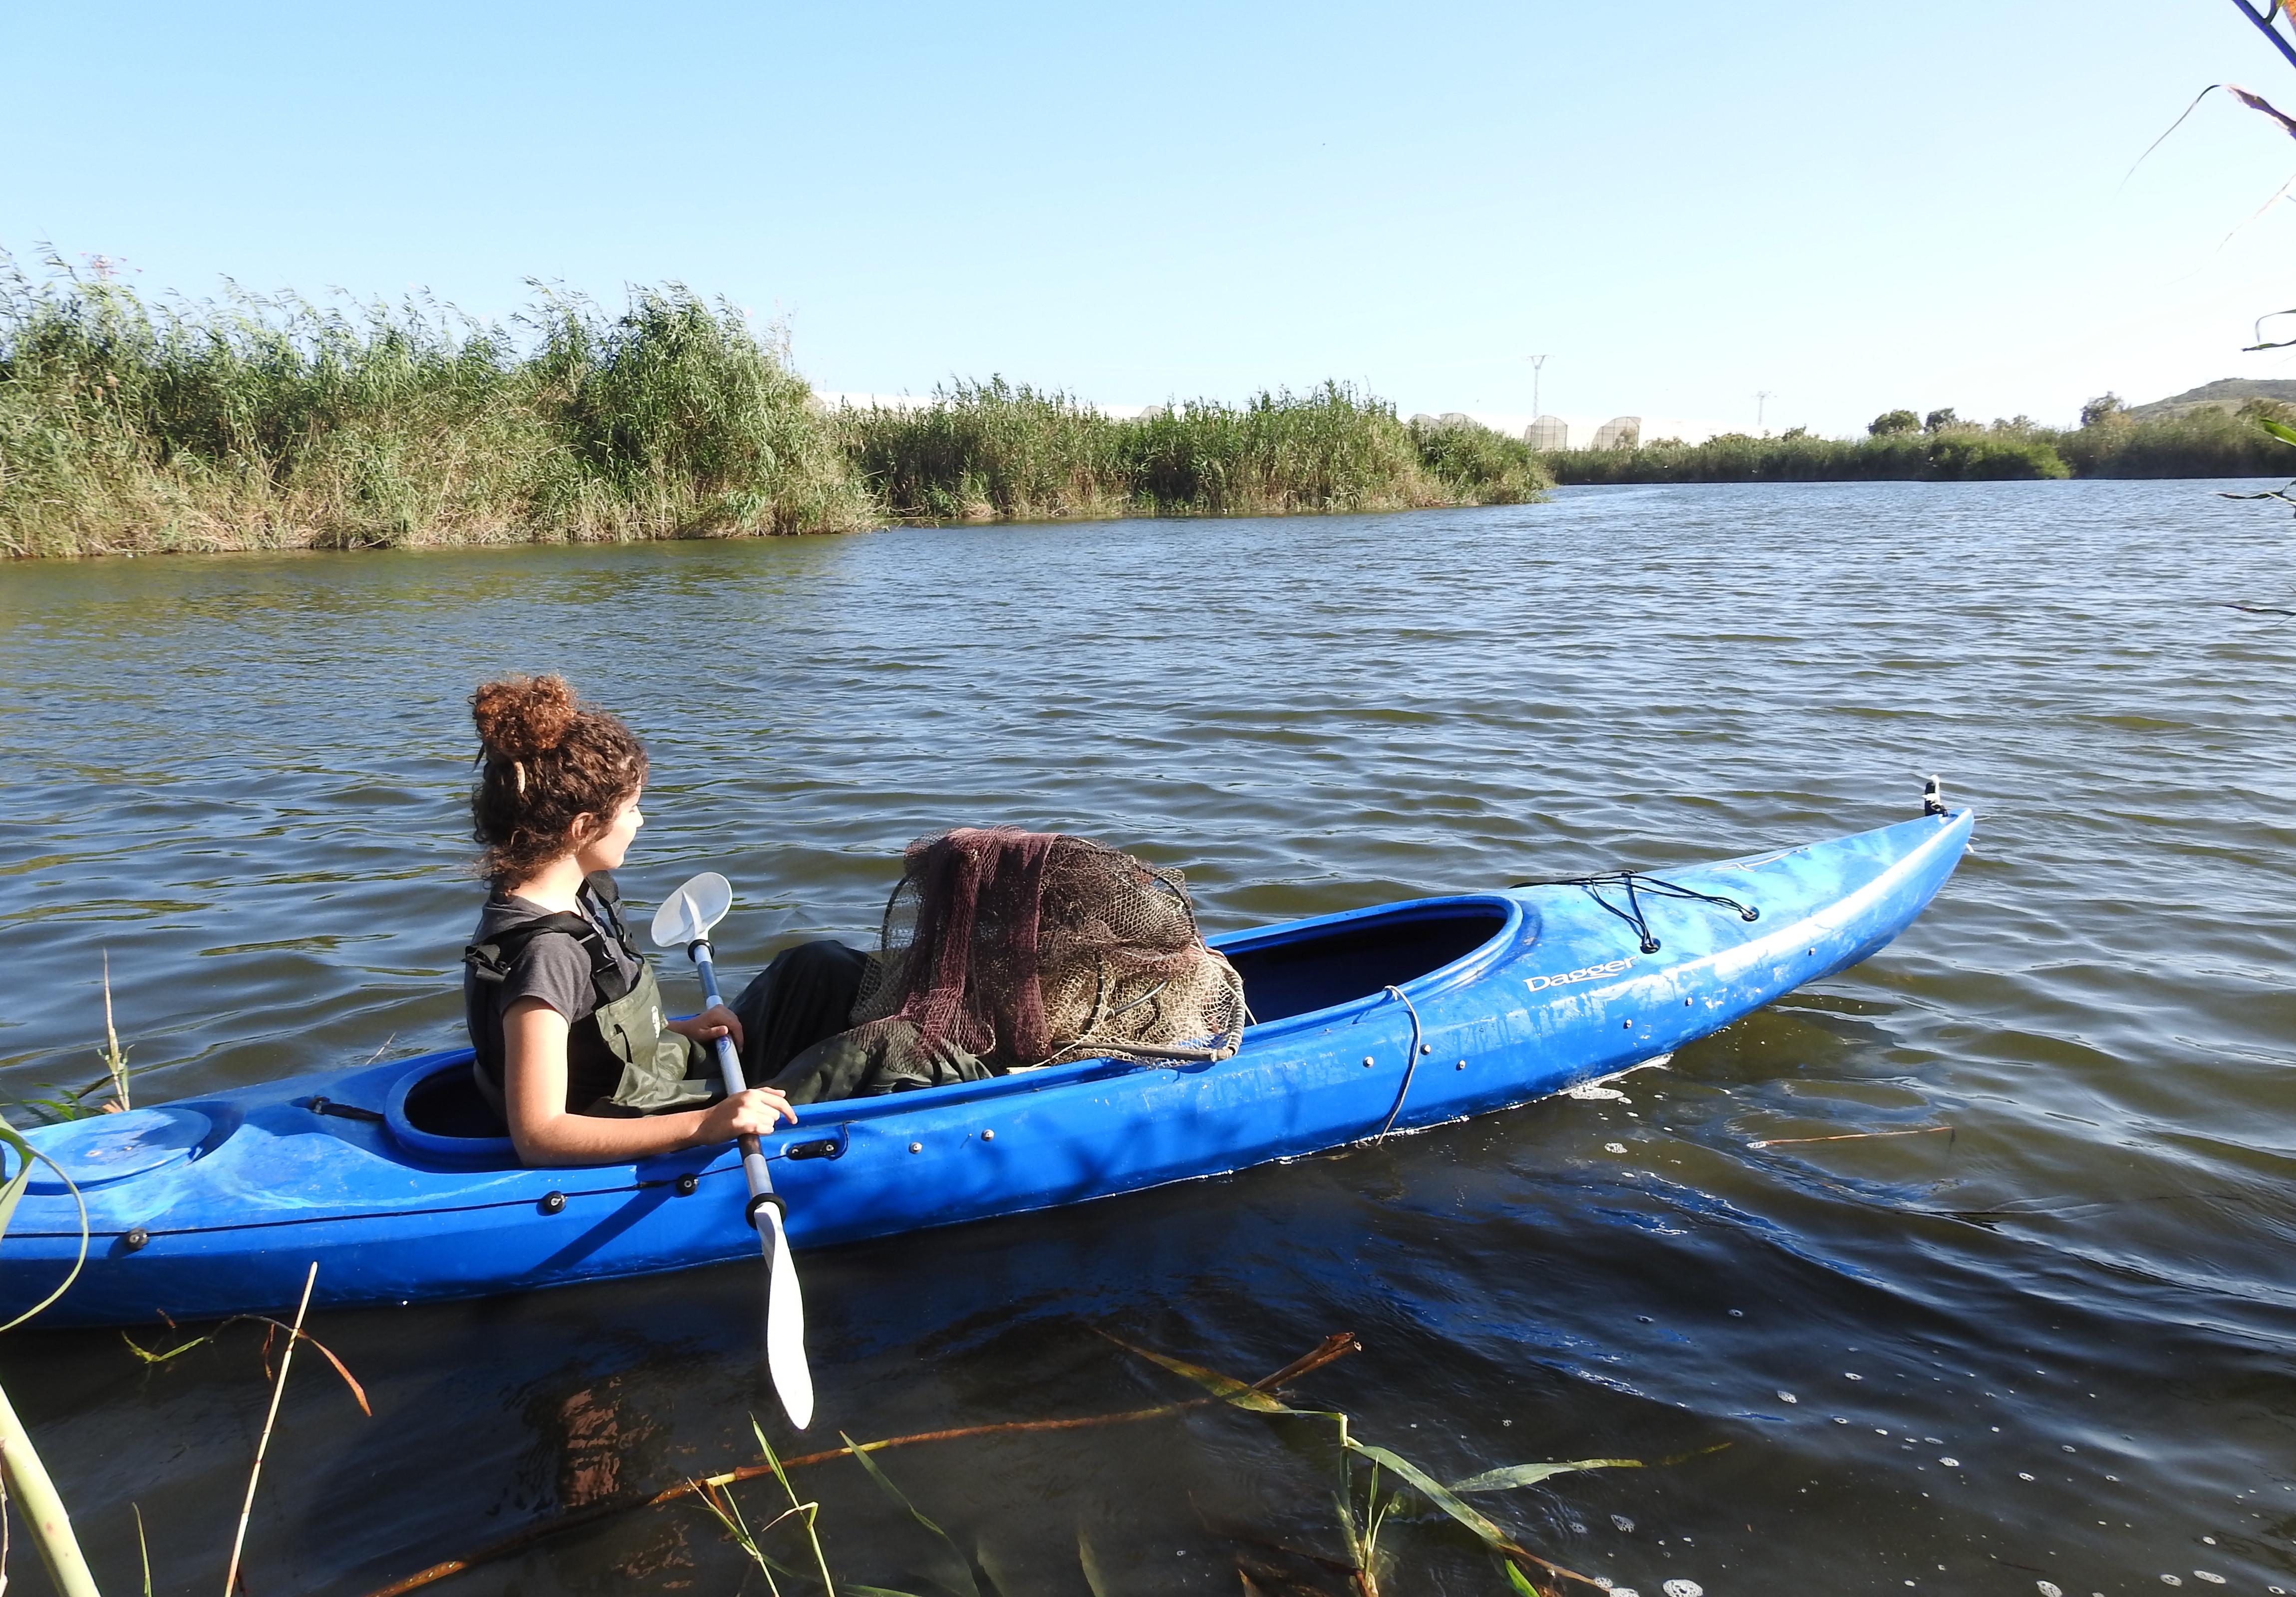 Muestreo en la Laguna de las Moreras. Imagen: Antonio Zamora/ANSE